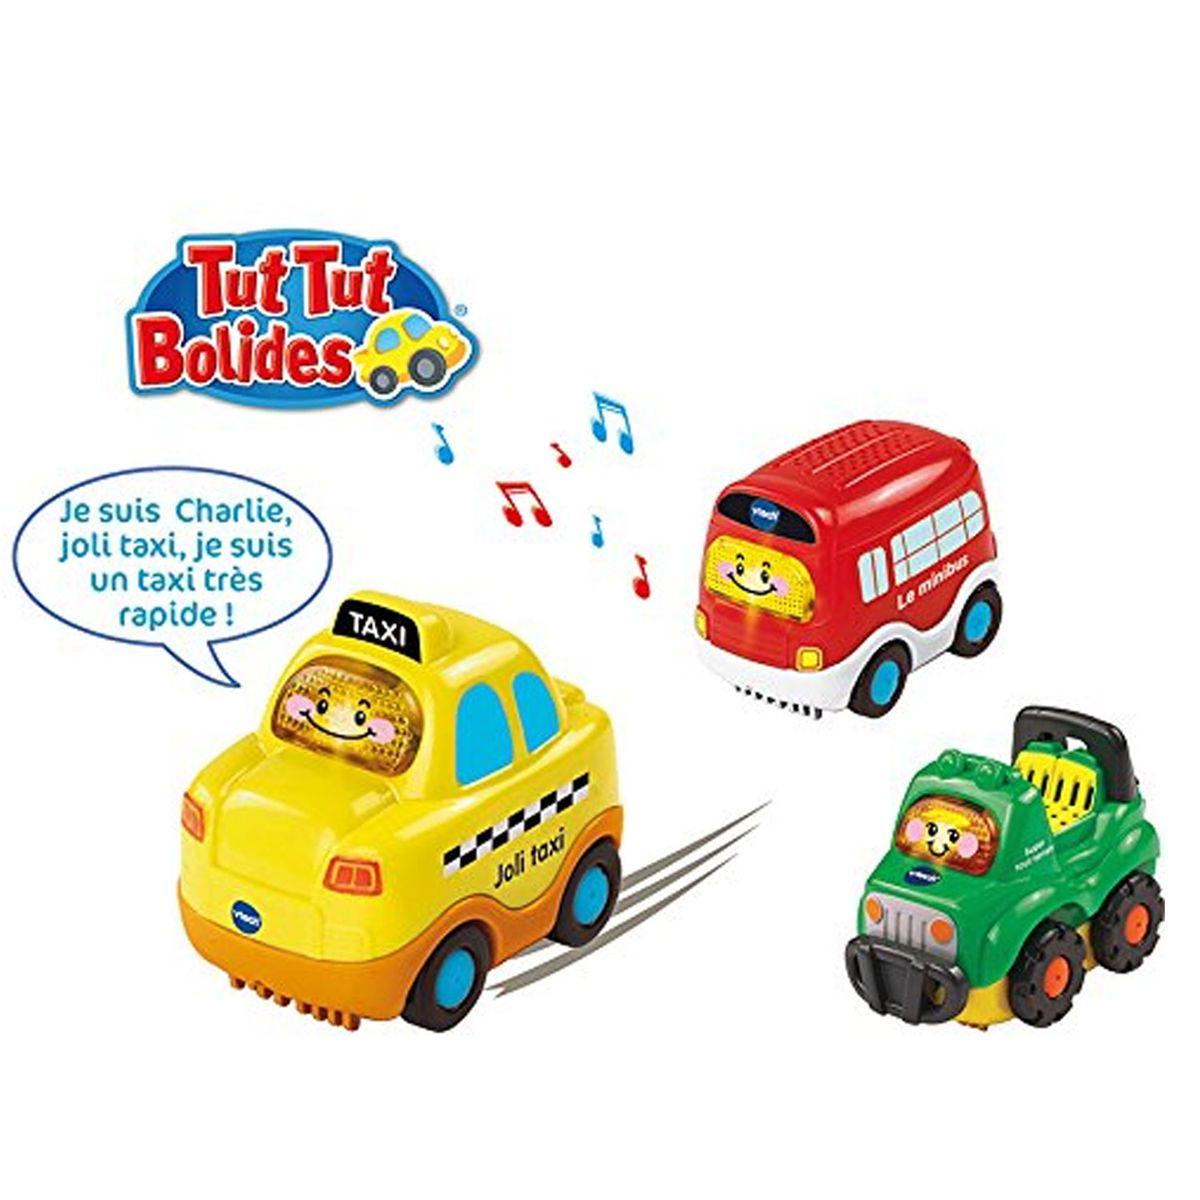 4x4 Bolides Coffret City TaxiBus Tut Et Véhicules Trio rCBoWdxEQe